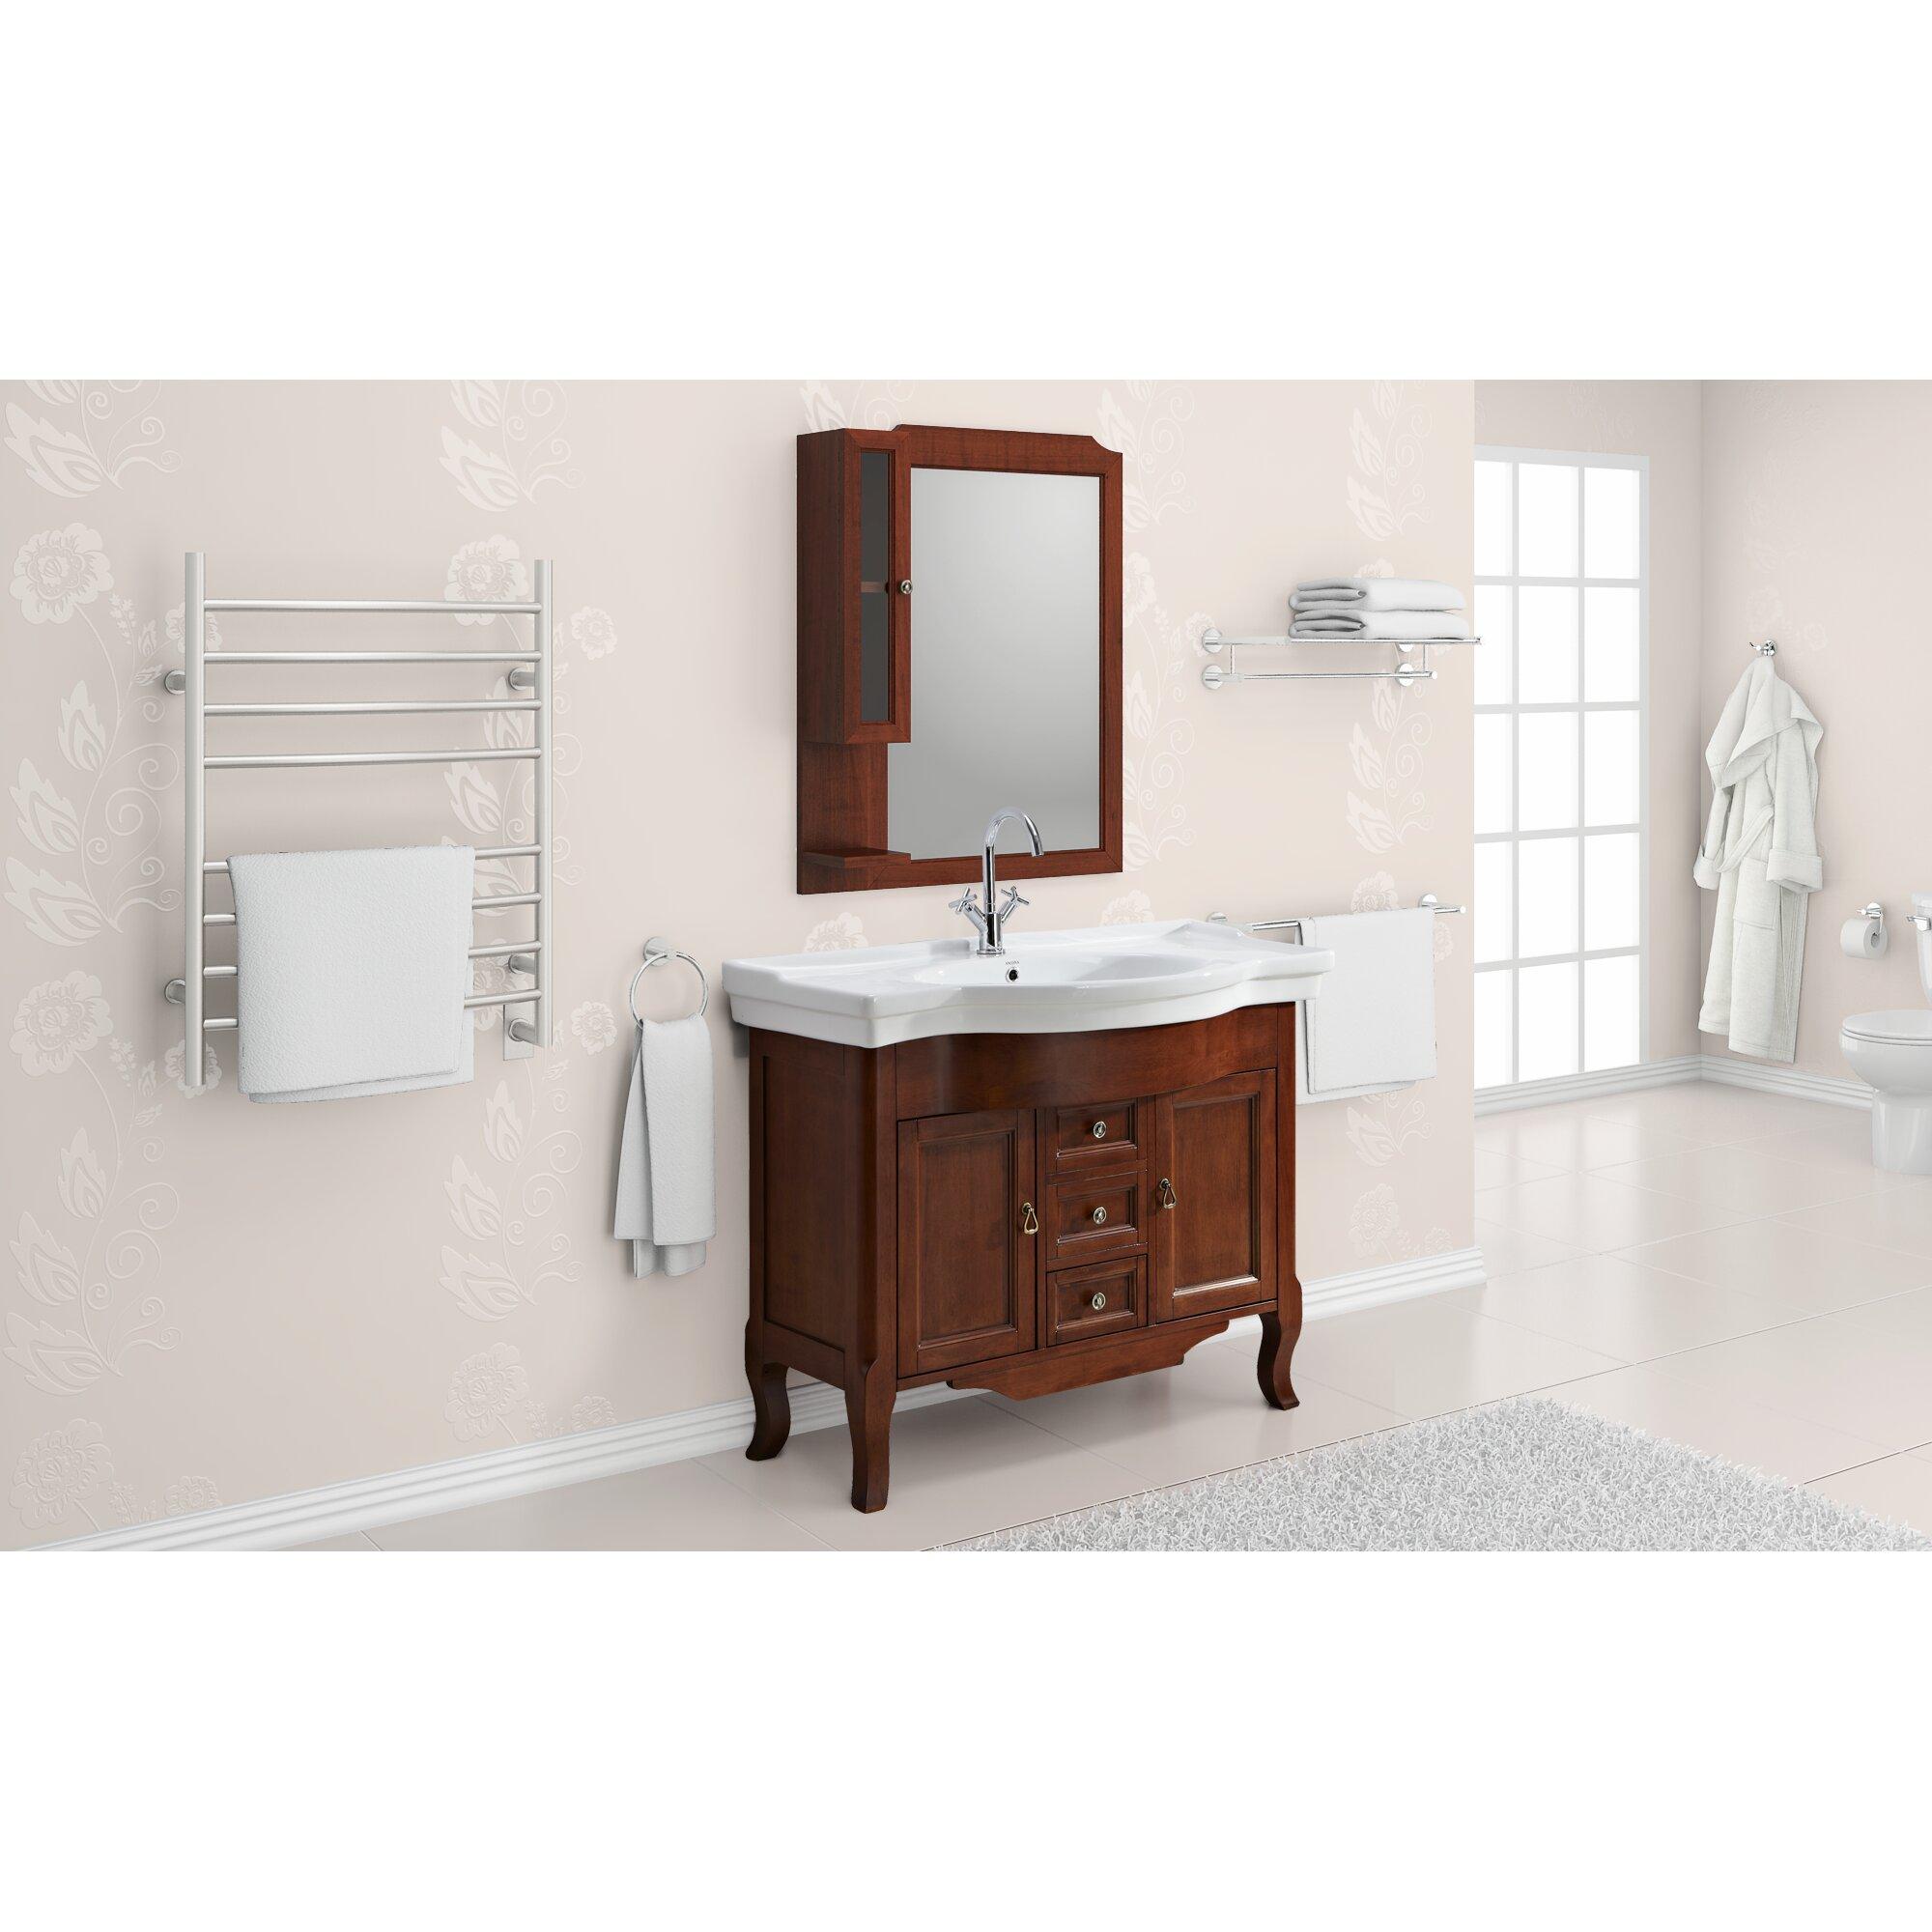 4 Piece Bathroom Accessory Set Ancona 4 Piece Bathroom Hardware Set Reviews Wayfair